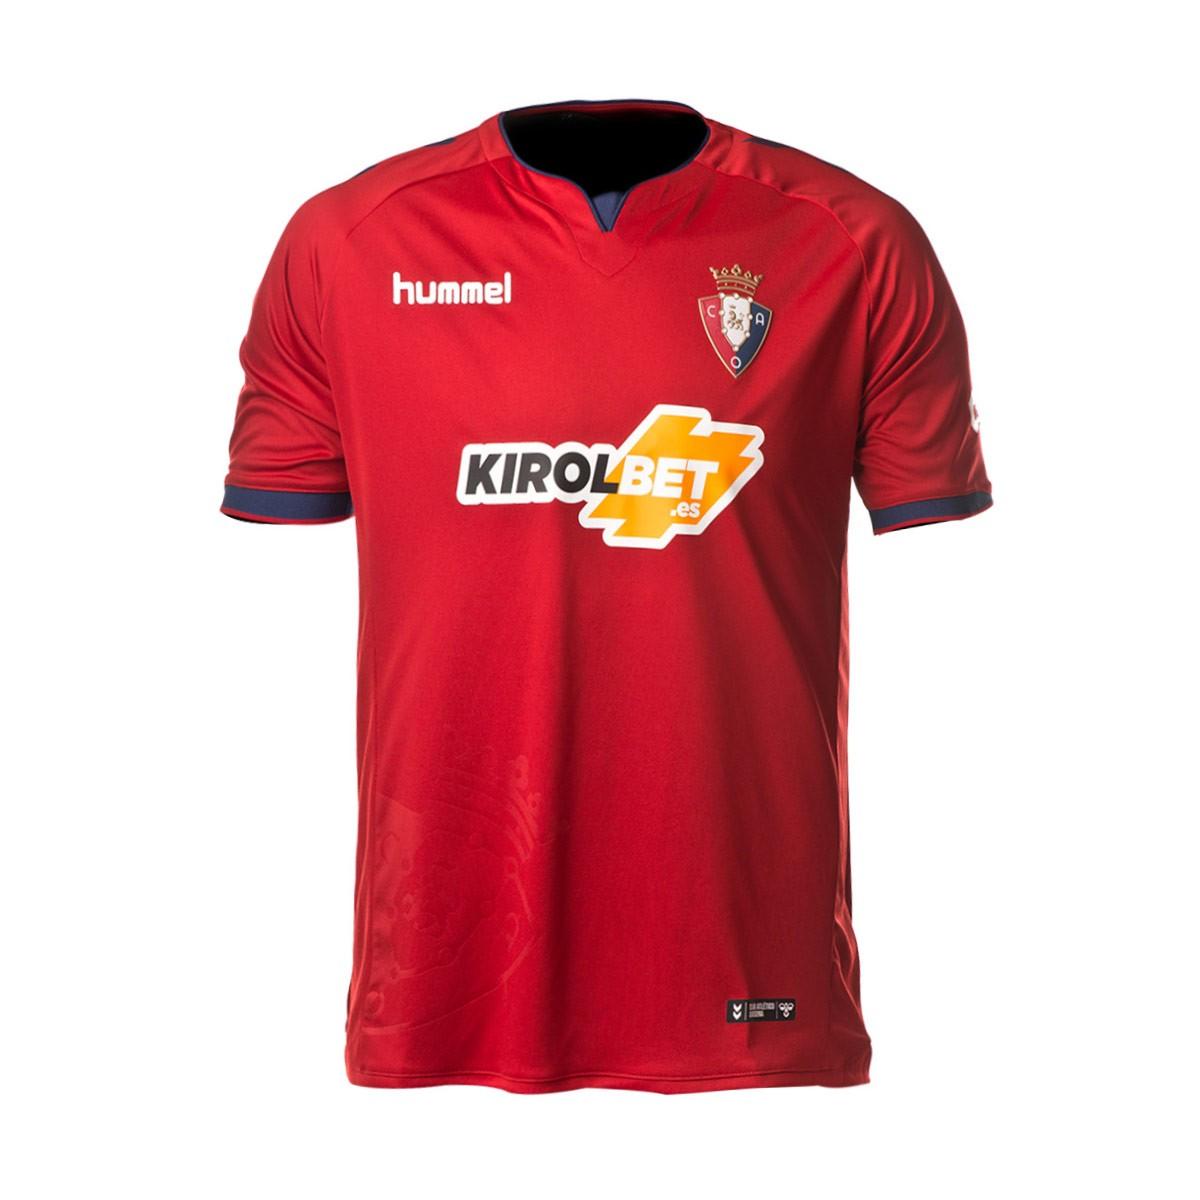 814637fbc Jersey Hummel CA Osasuna 2018-2019 Home Red-Marine - Football store ...